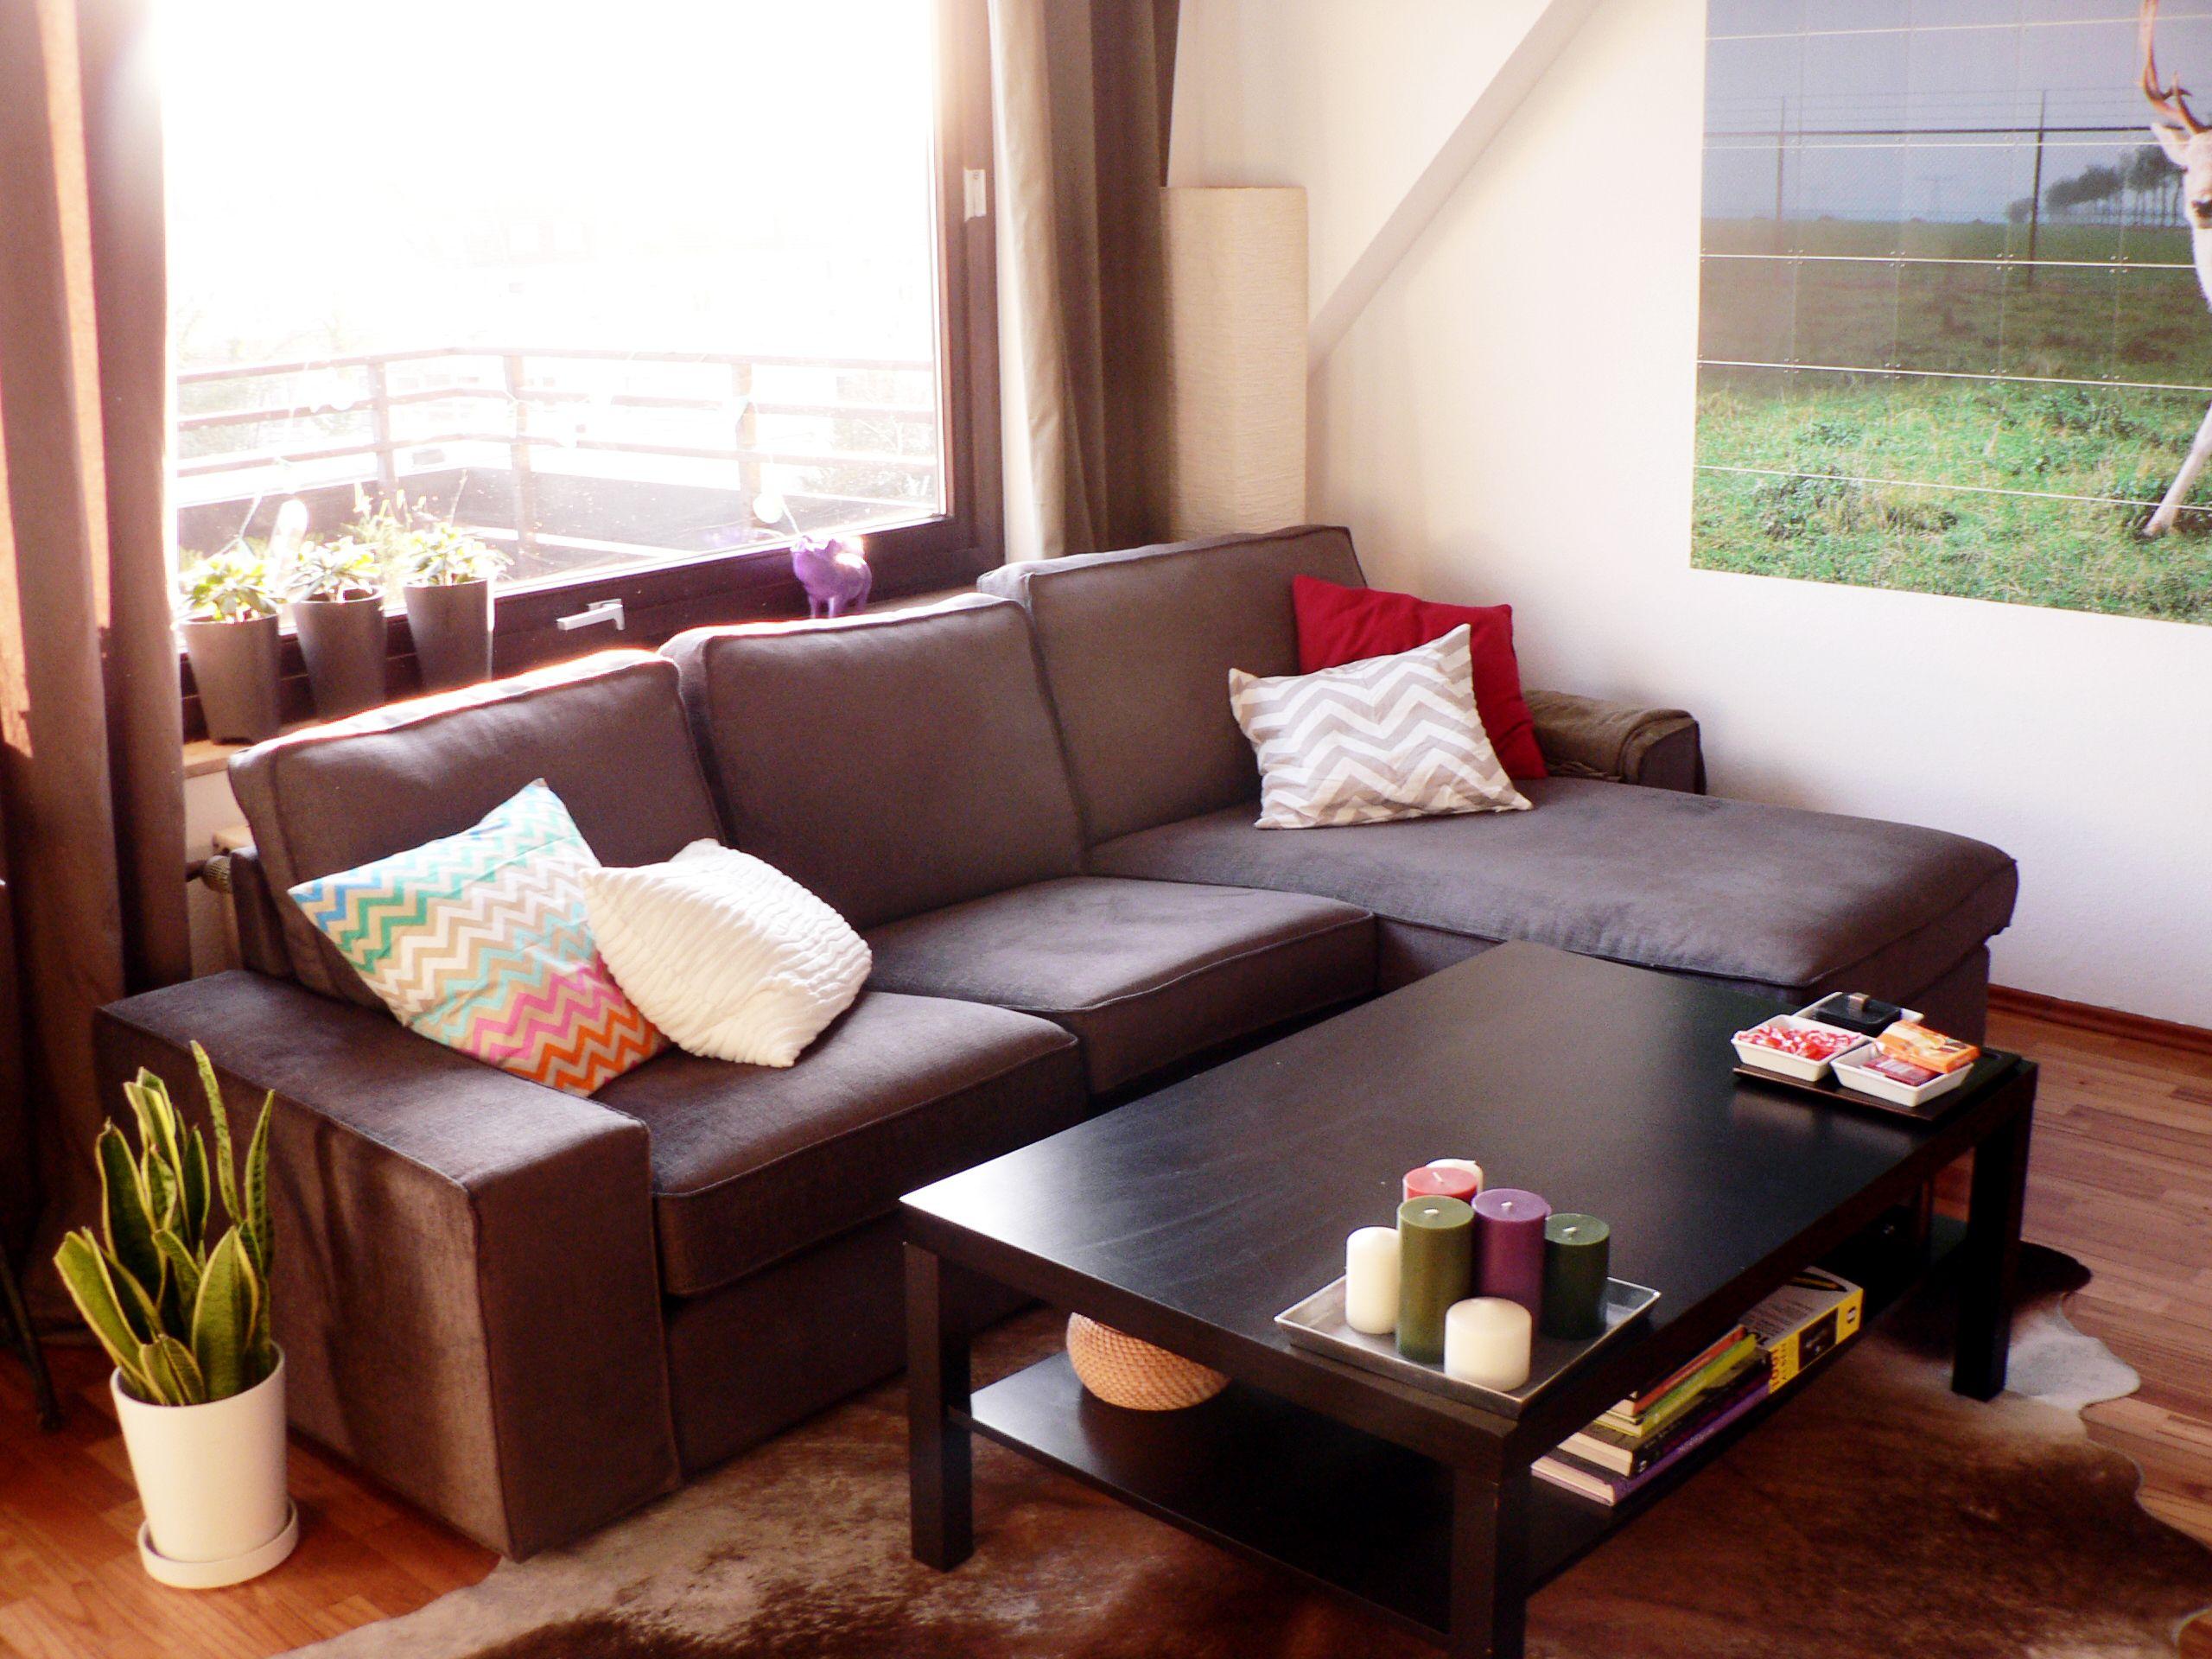 Divano Kivik ~ Ikea kivik sofa home general decorating ideas